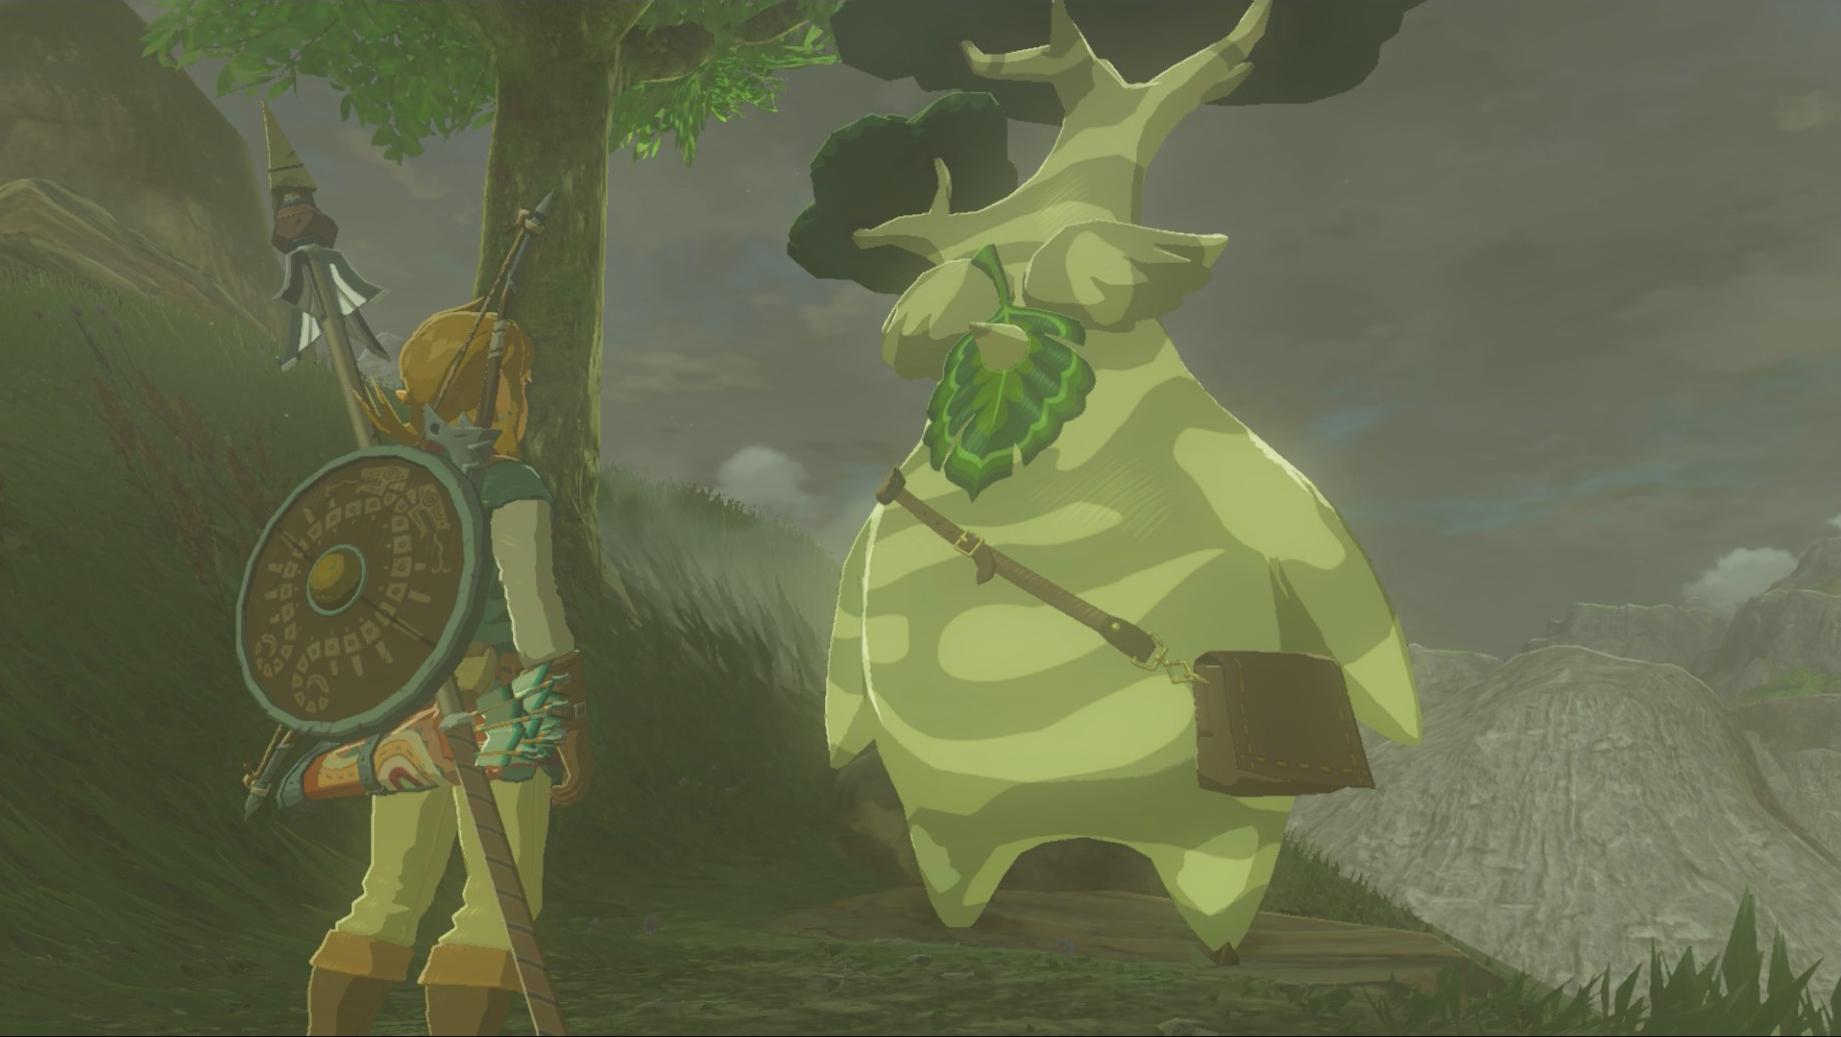 Breath Of The Wild Korok Seed Locations Zelda Dungeon